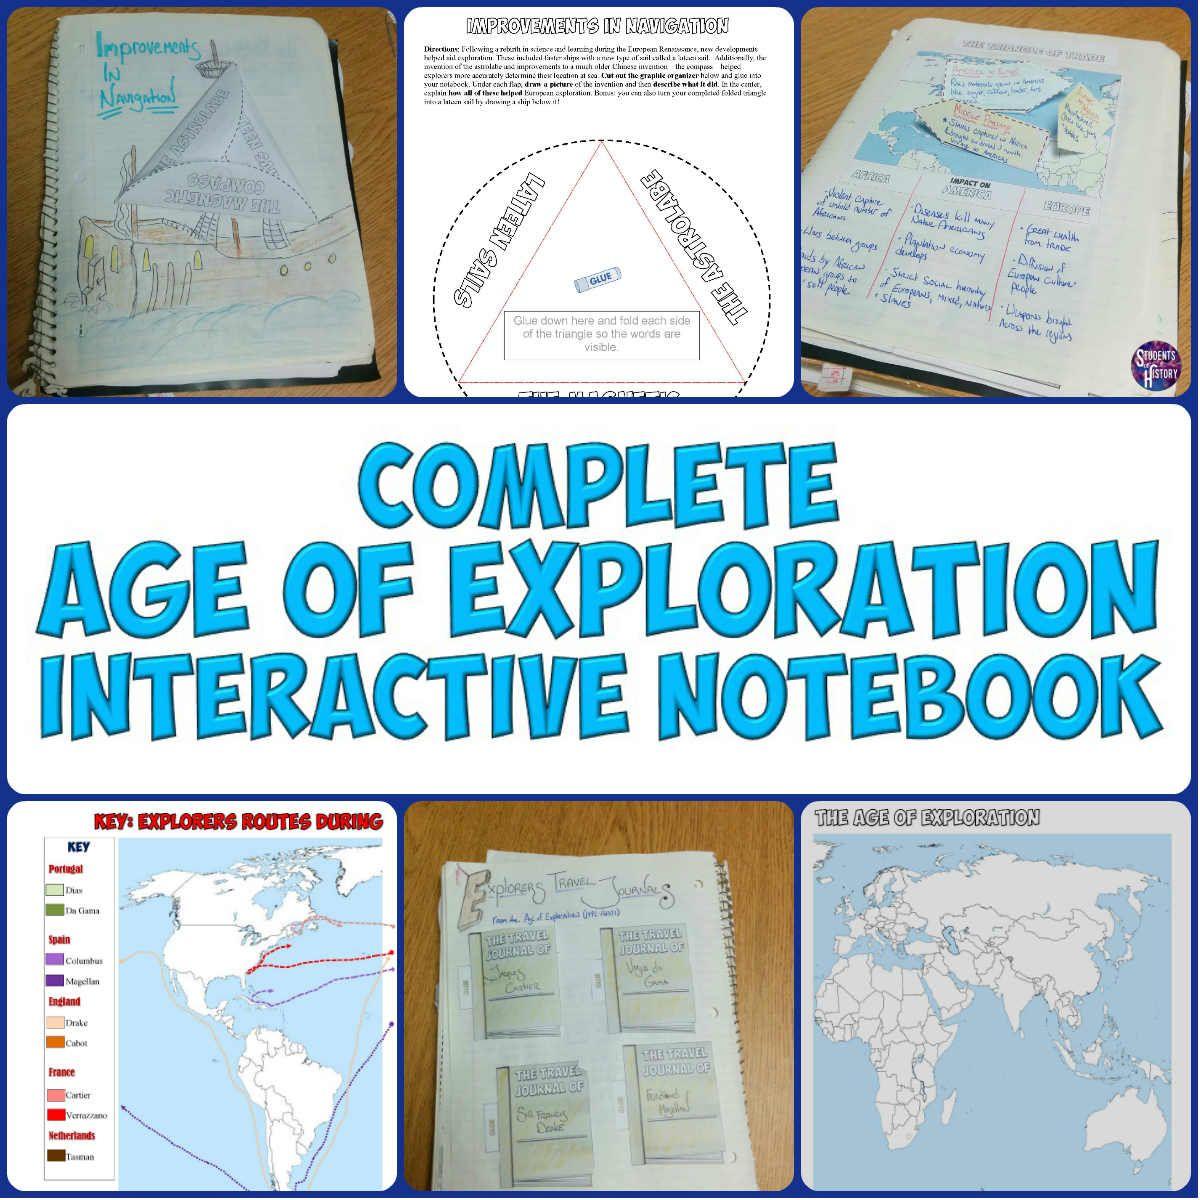 worksheet Age Of Exploration Worksheet age of exploration interactive notebook notebooks notebook